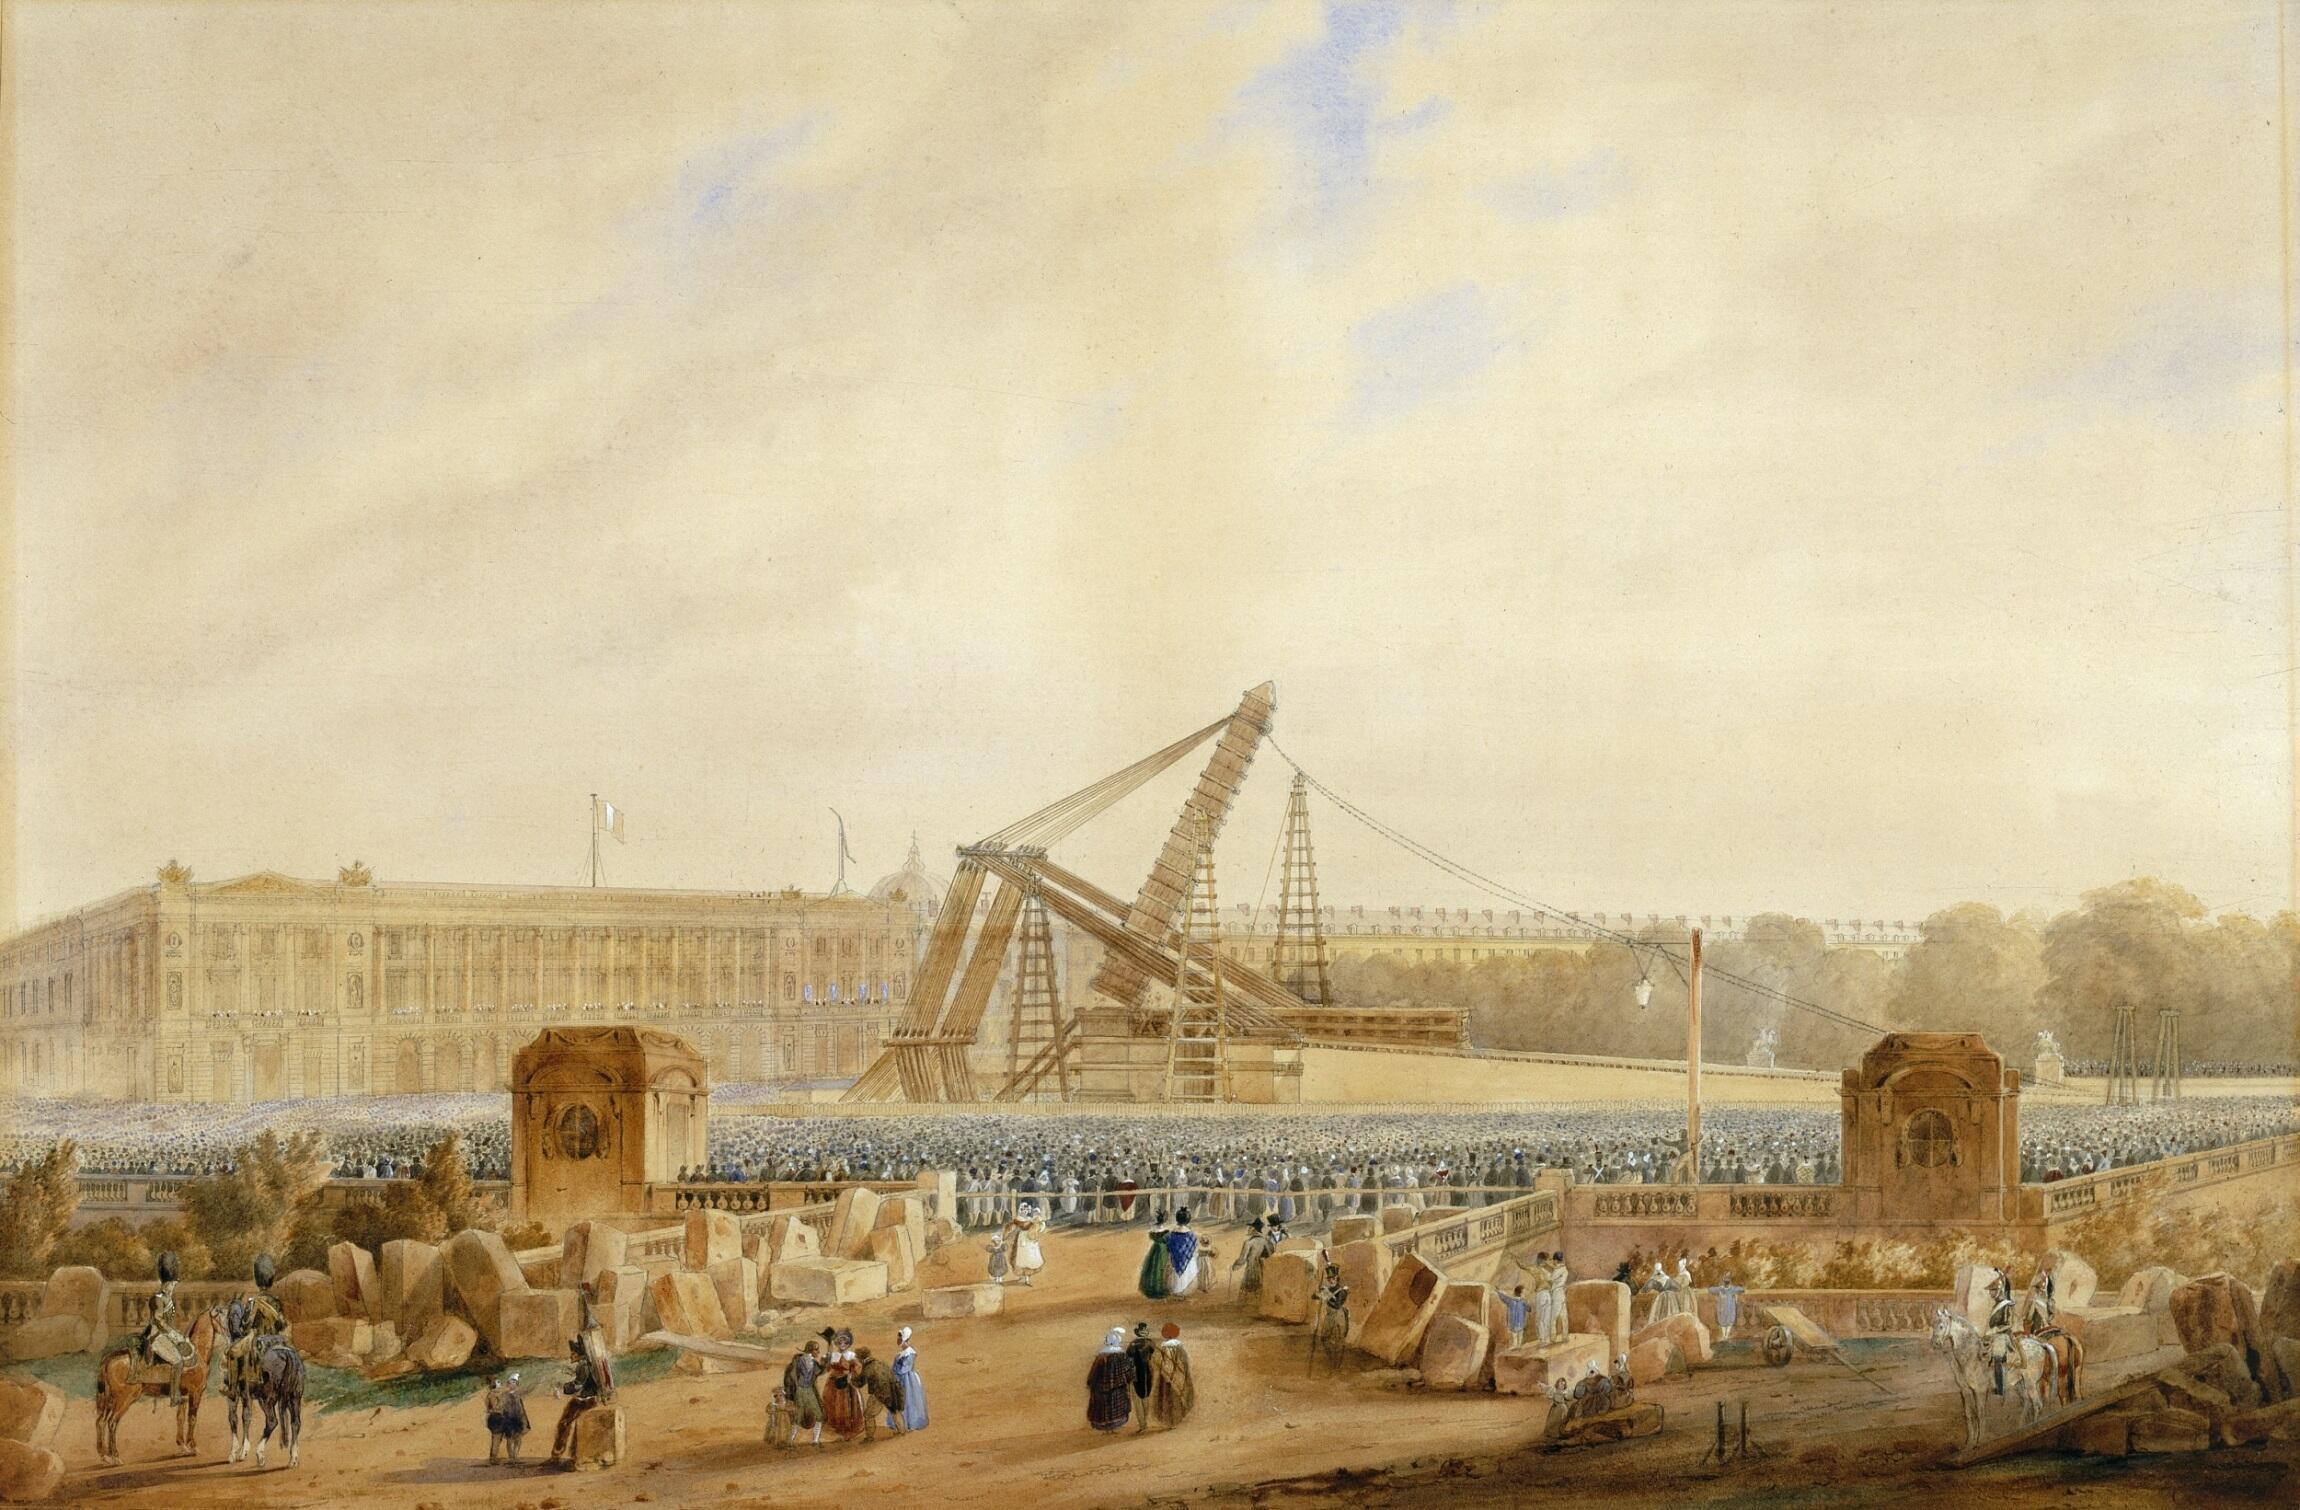 Aquarelle représentant l'érection de l'obélisque de Louxor, le 25 octobre 1836 (Cayrac, 1837).